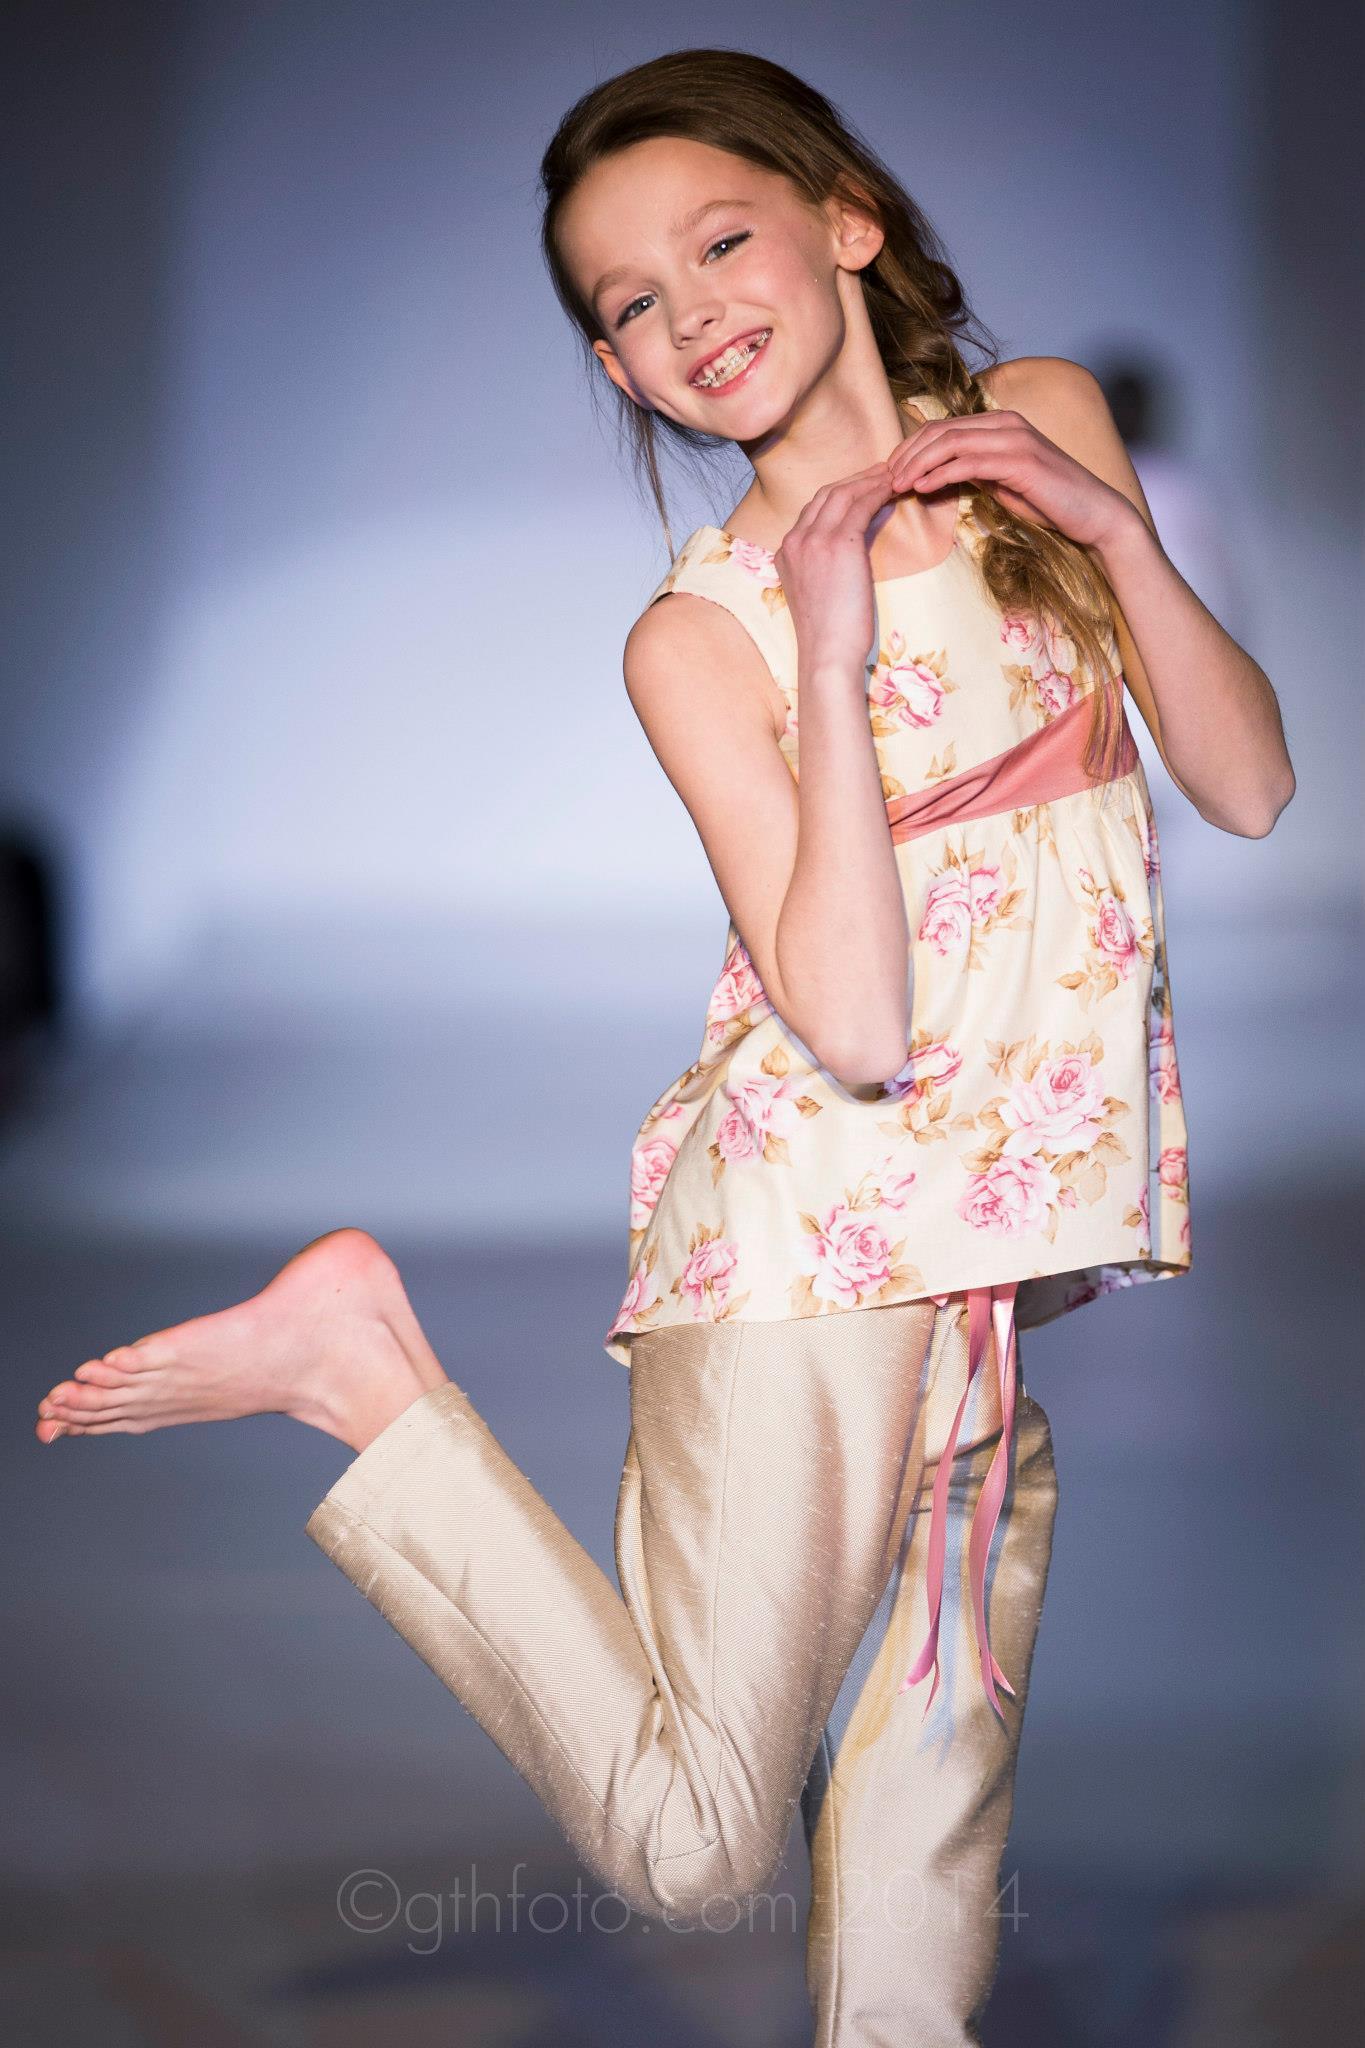 Hi-lo Shiny Rose Tank Outfit